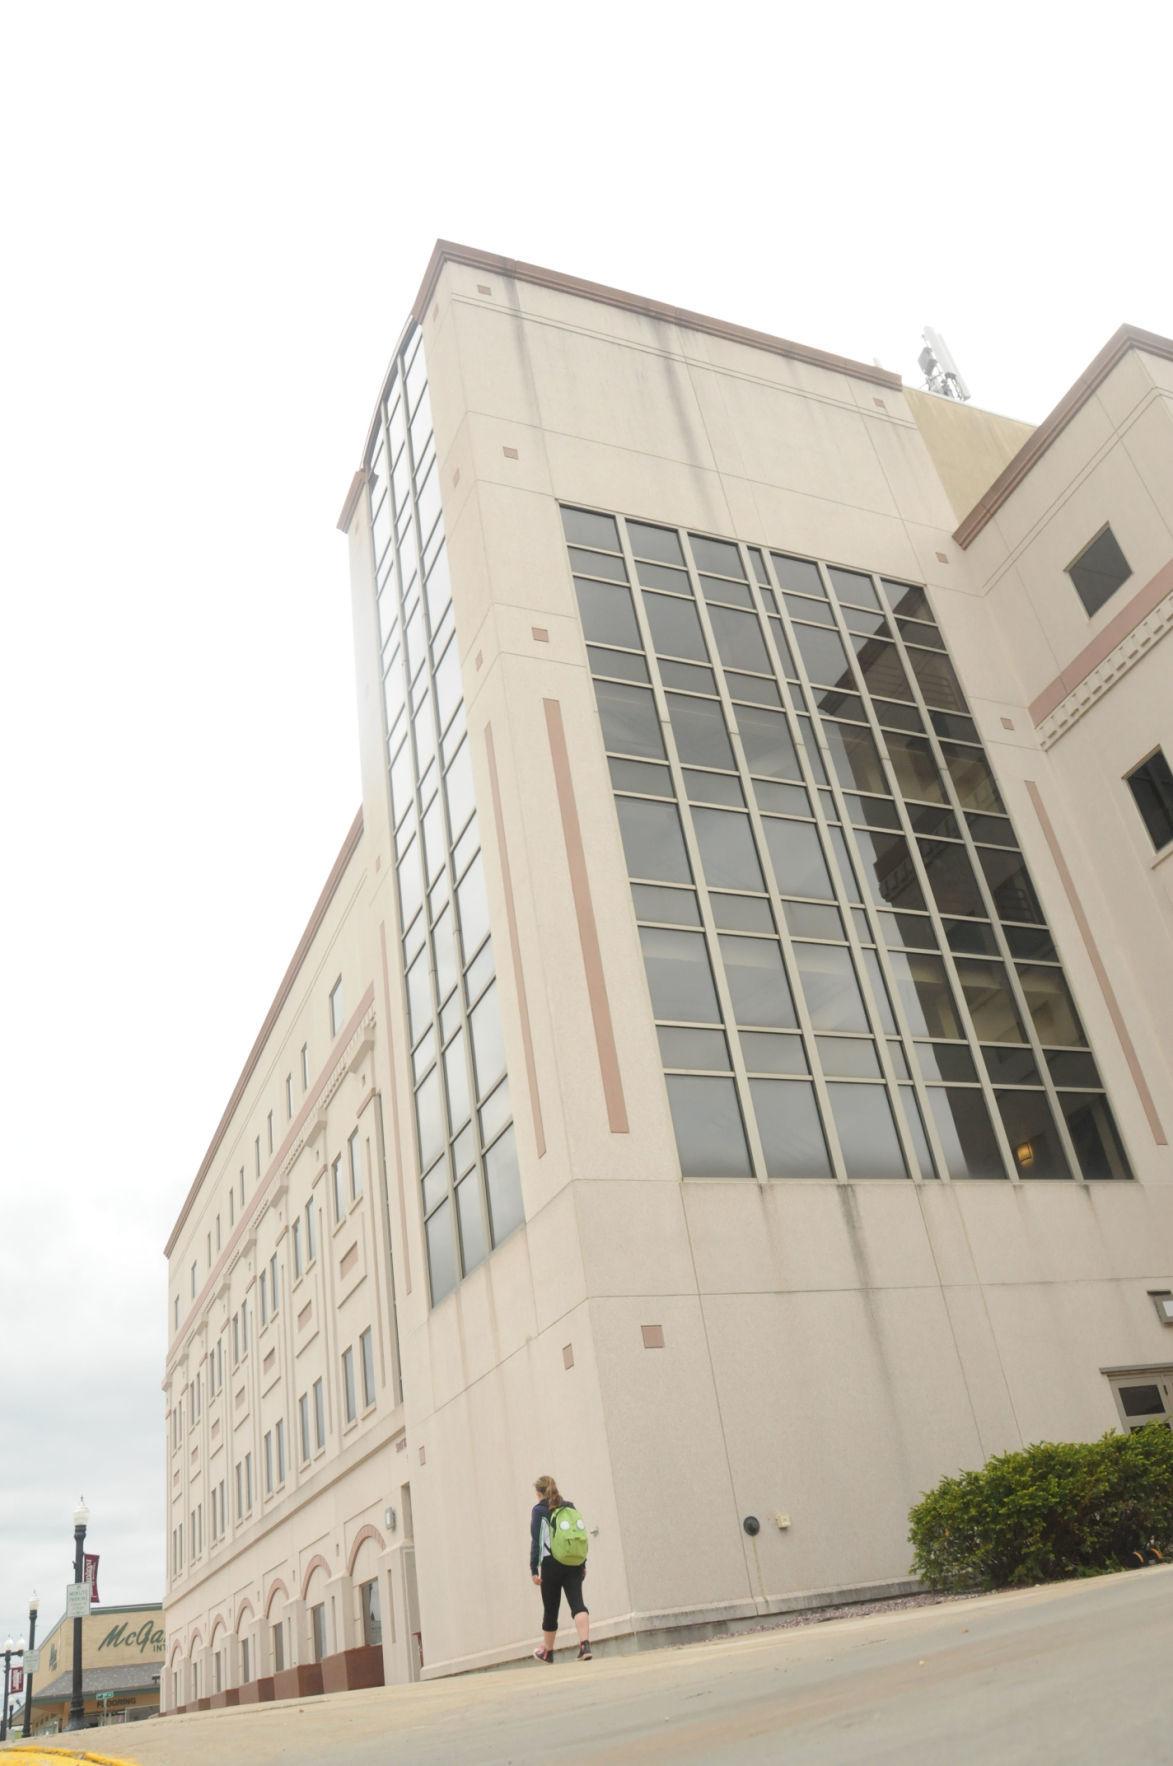 Sauk County Board to consider November ballot questions